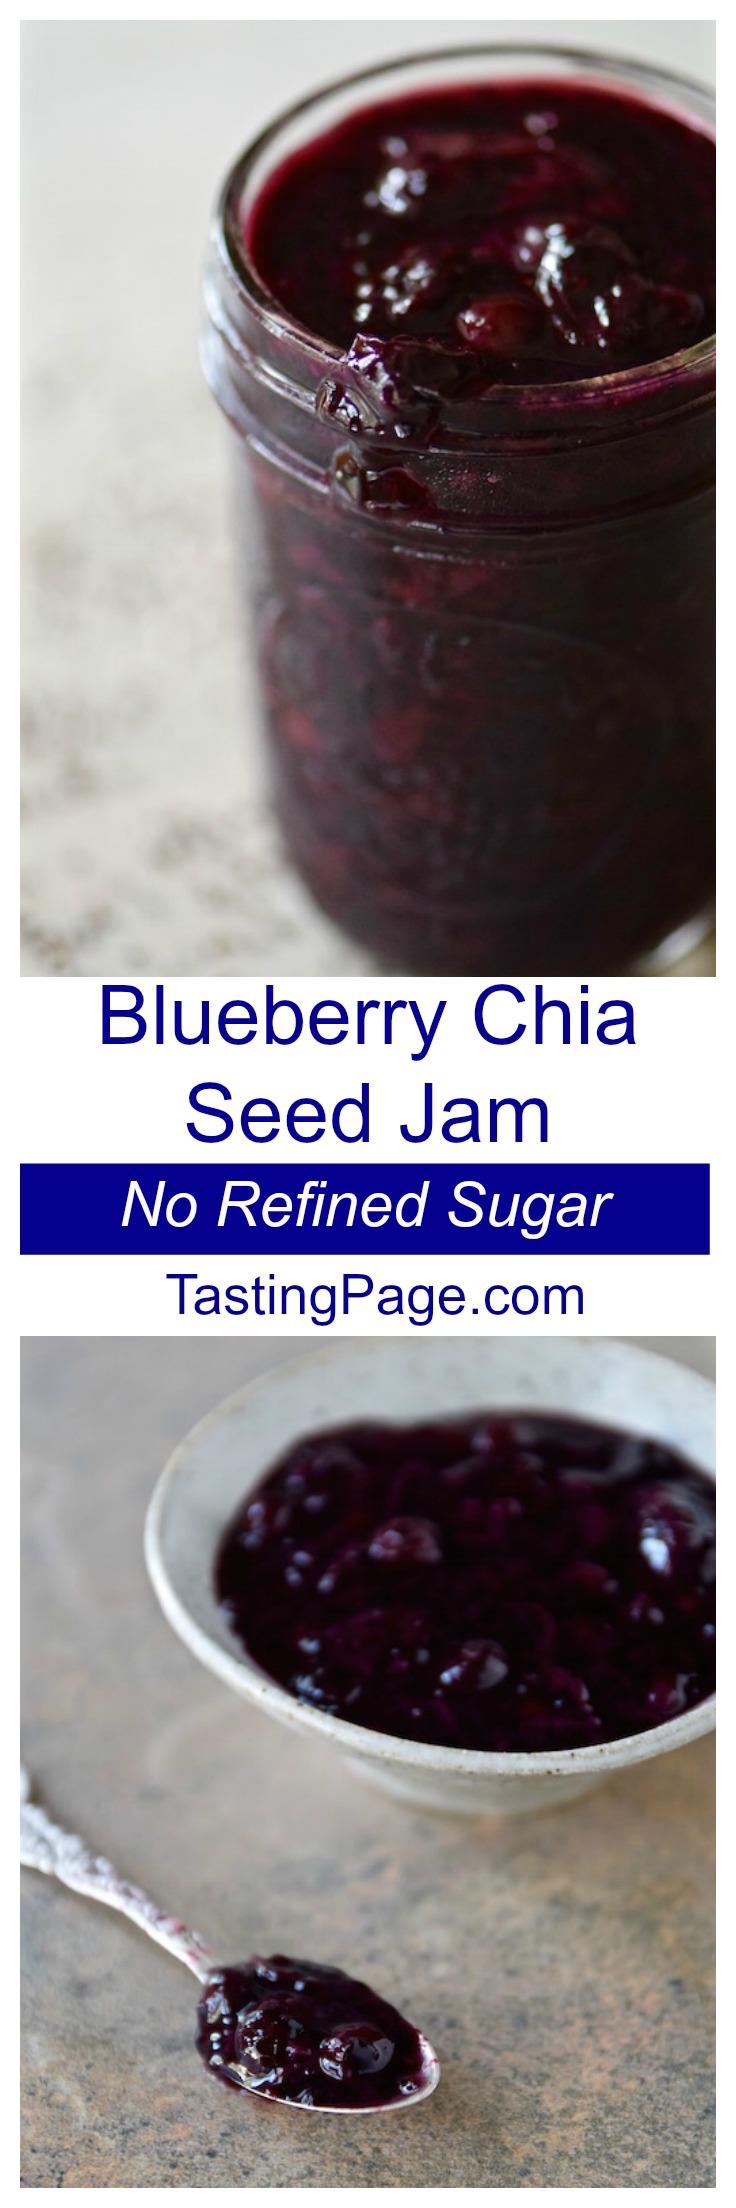 4 Ingredient Blueberry Vanilla Chia Seed jam with no refined sugar | TastingPage.com